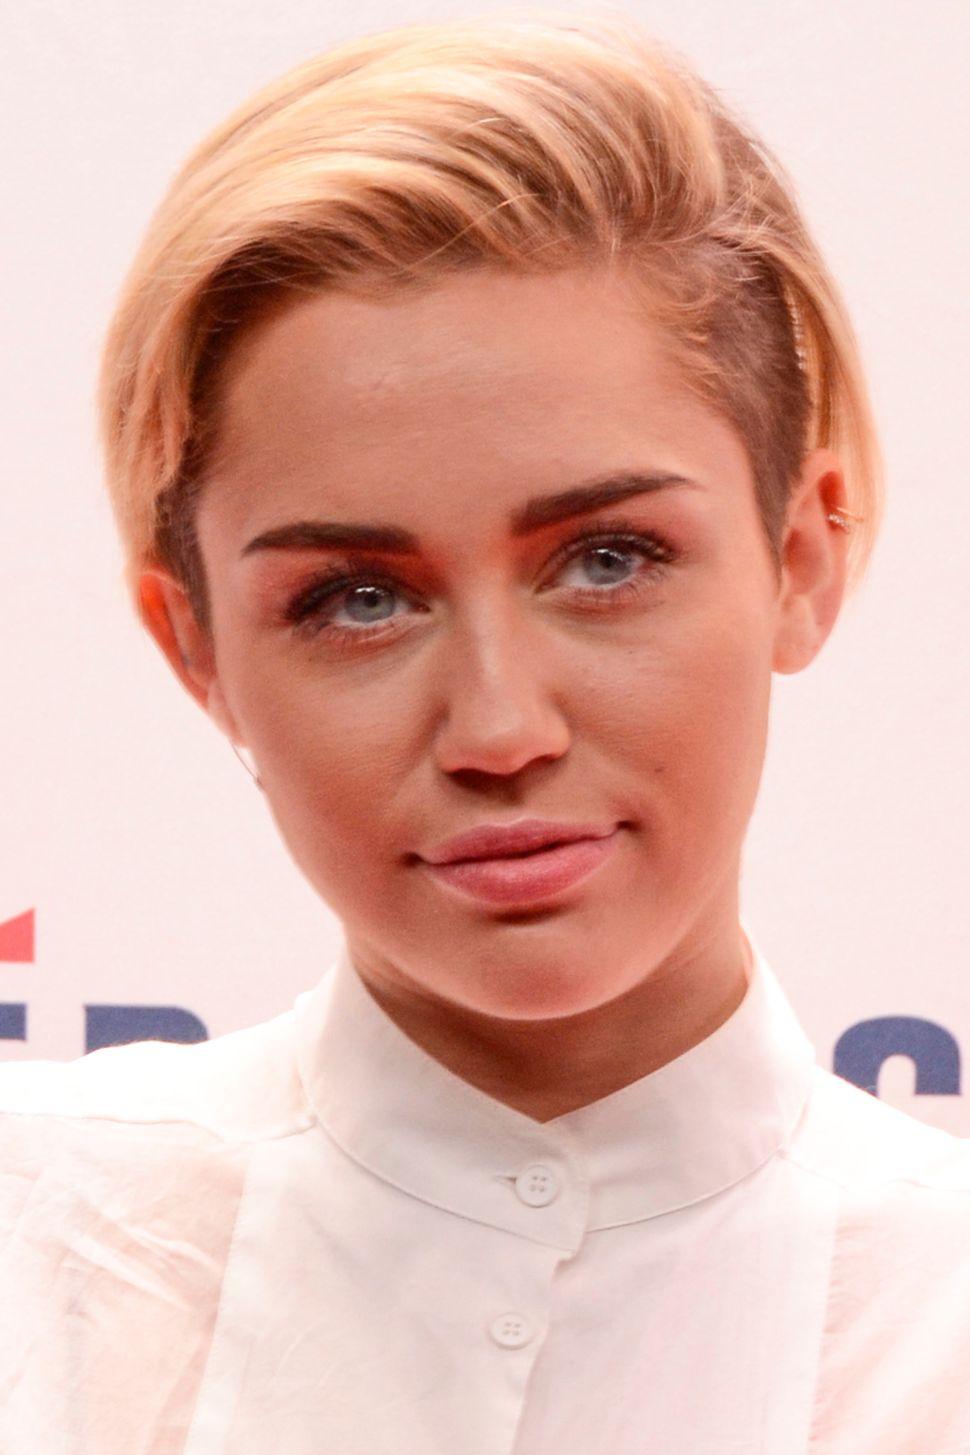 Morning Links: Miley Cyrus Studio Visit Edition